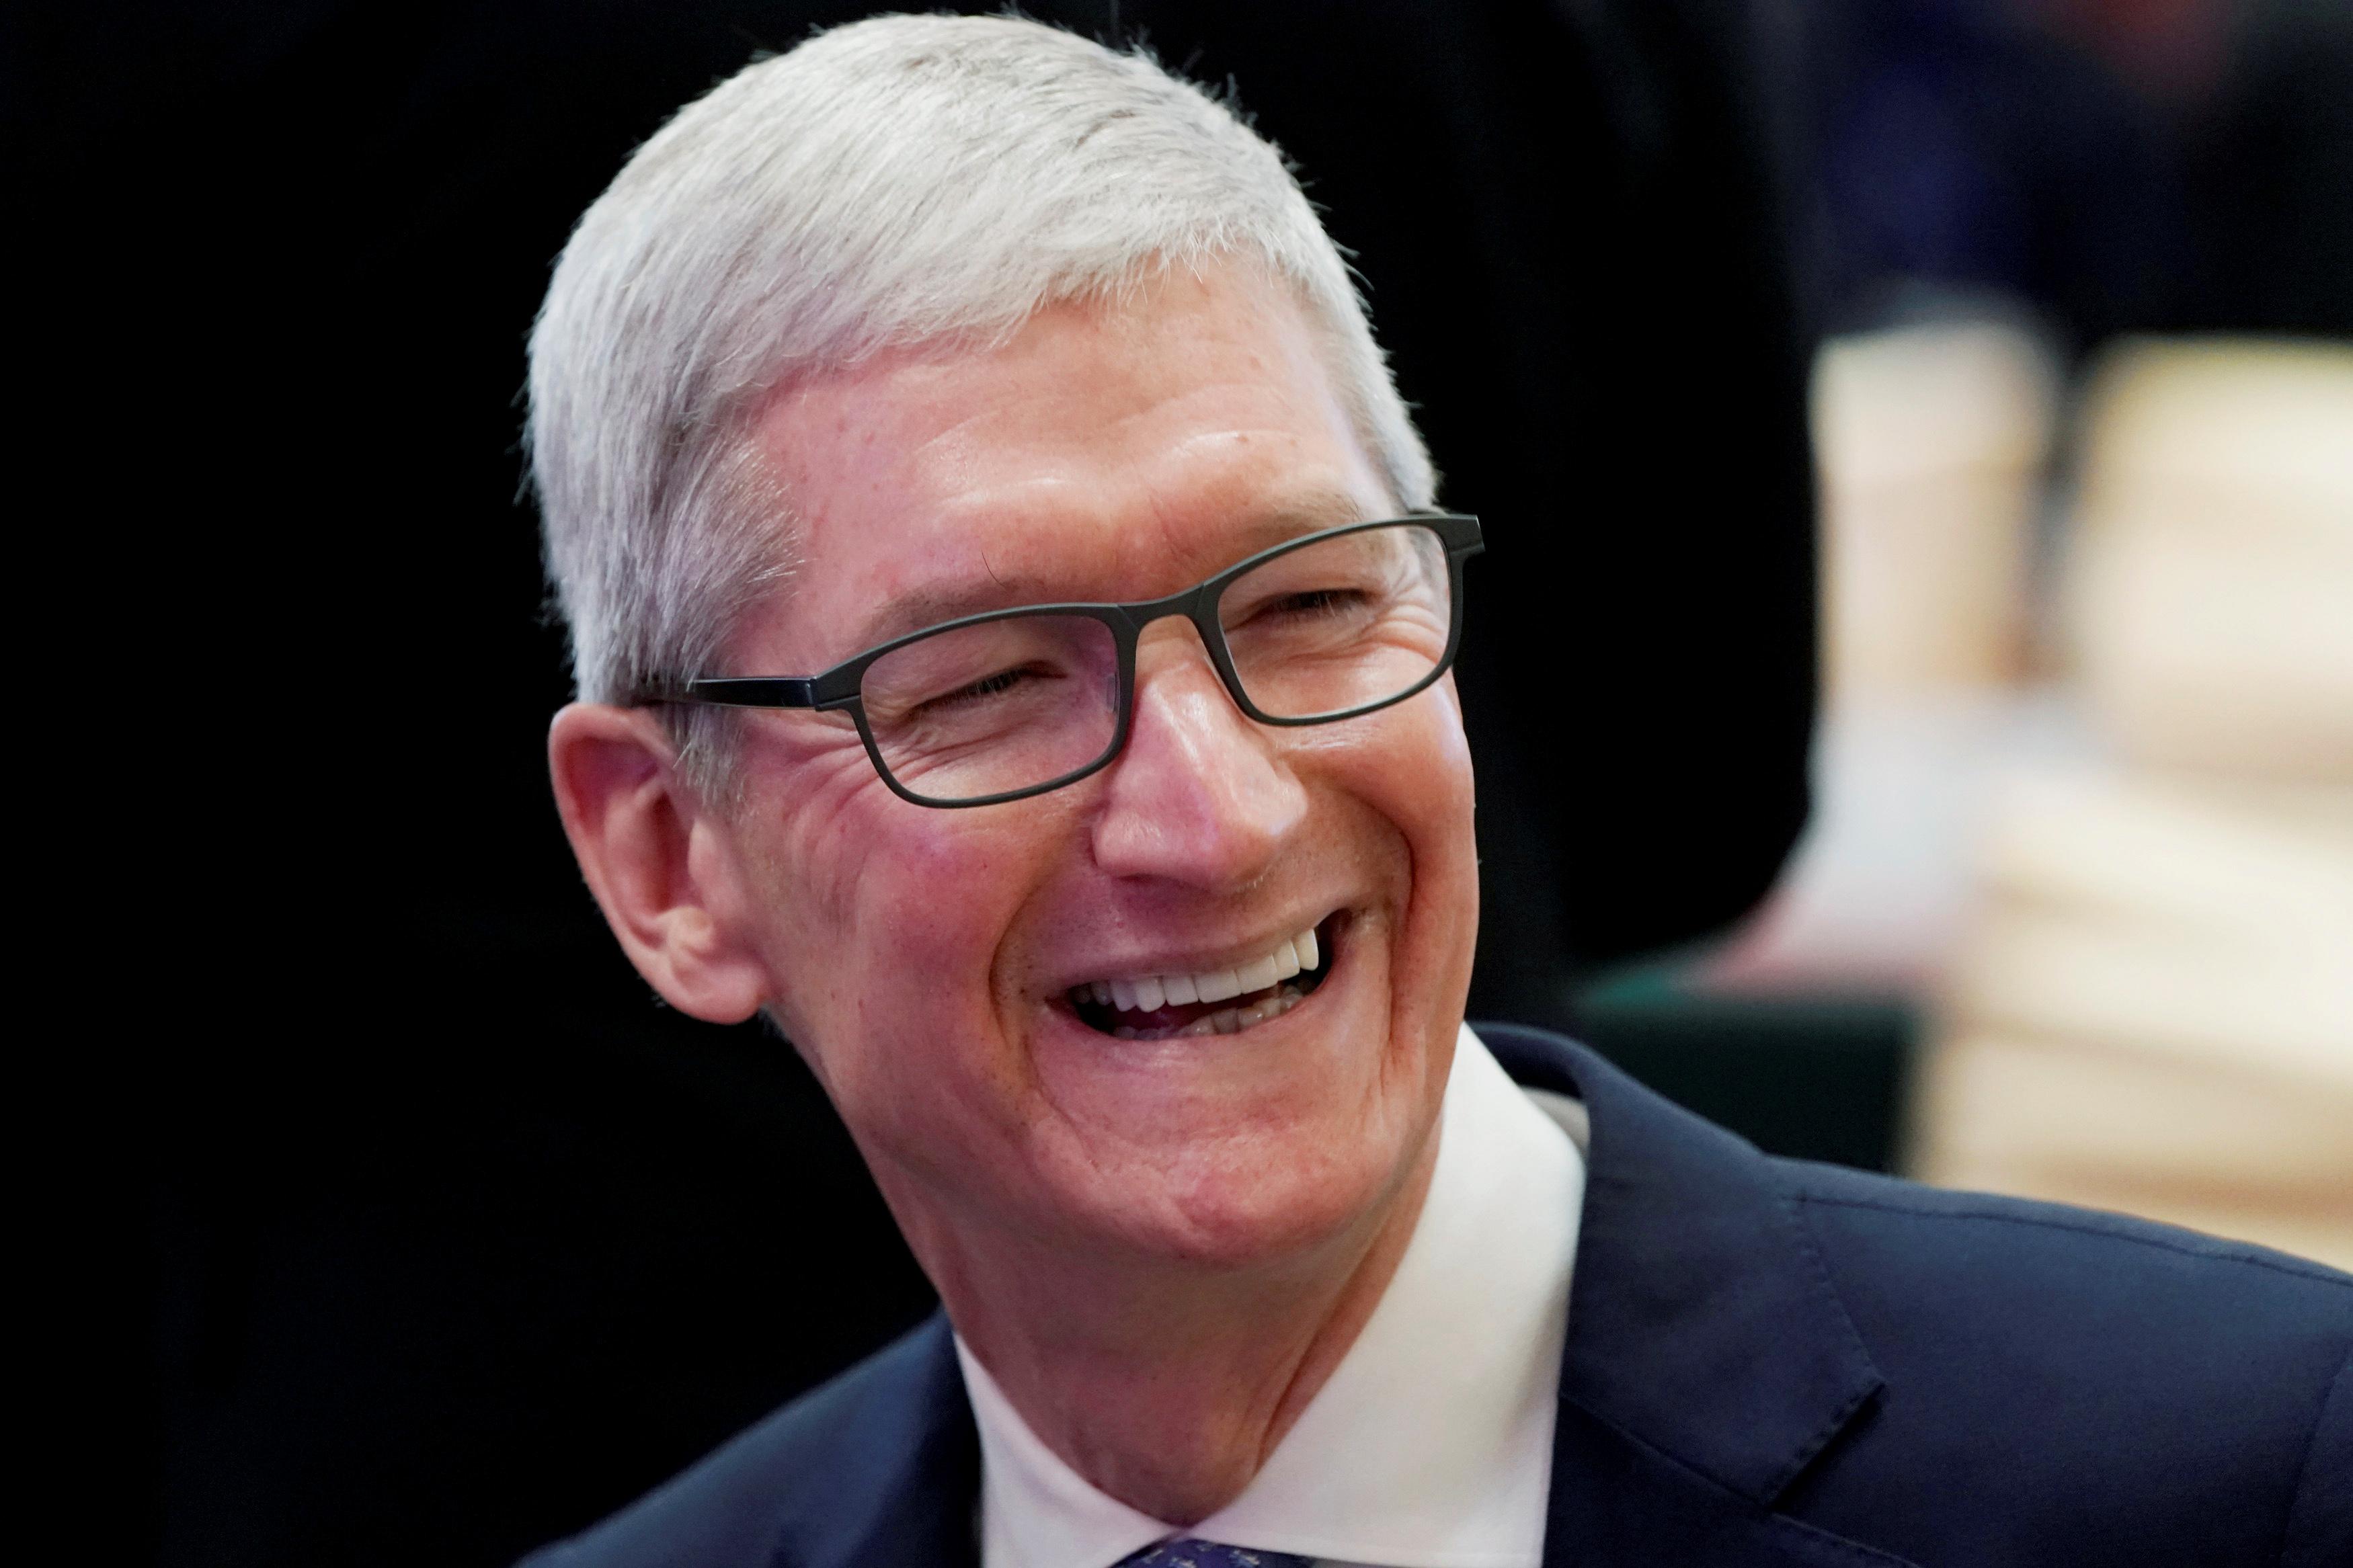 Apple CEO Tim Cook's Duke University commencement speech honored